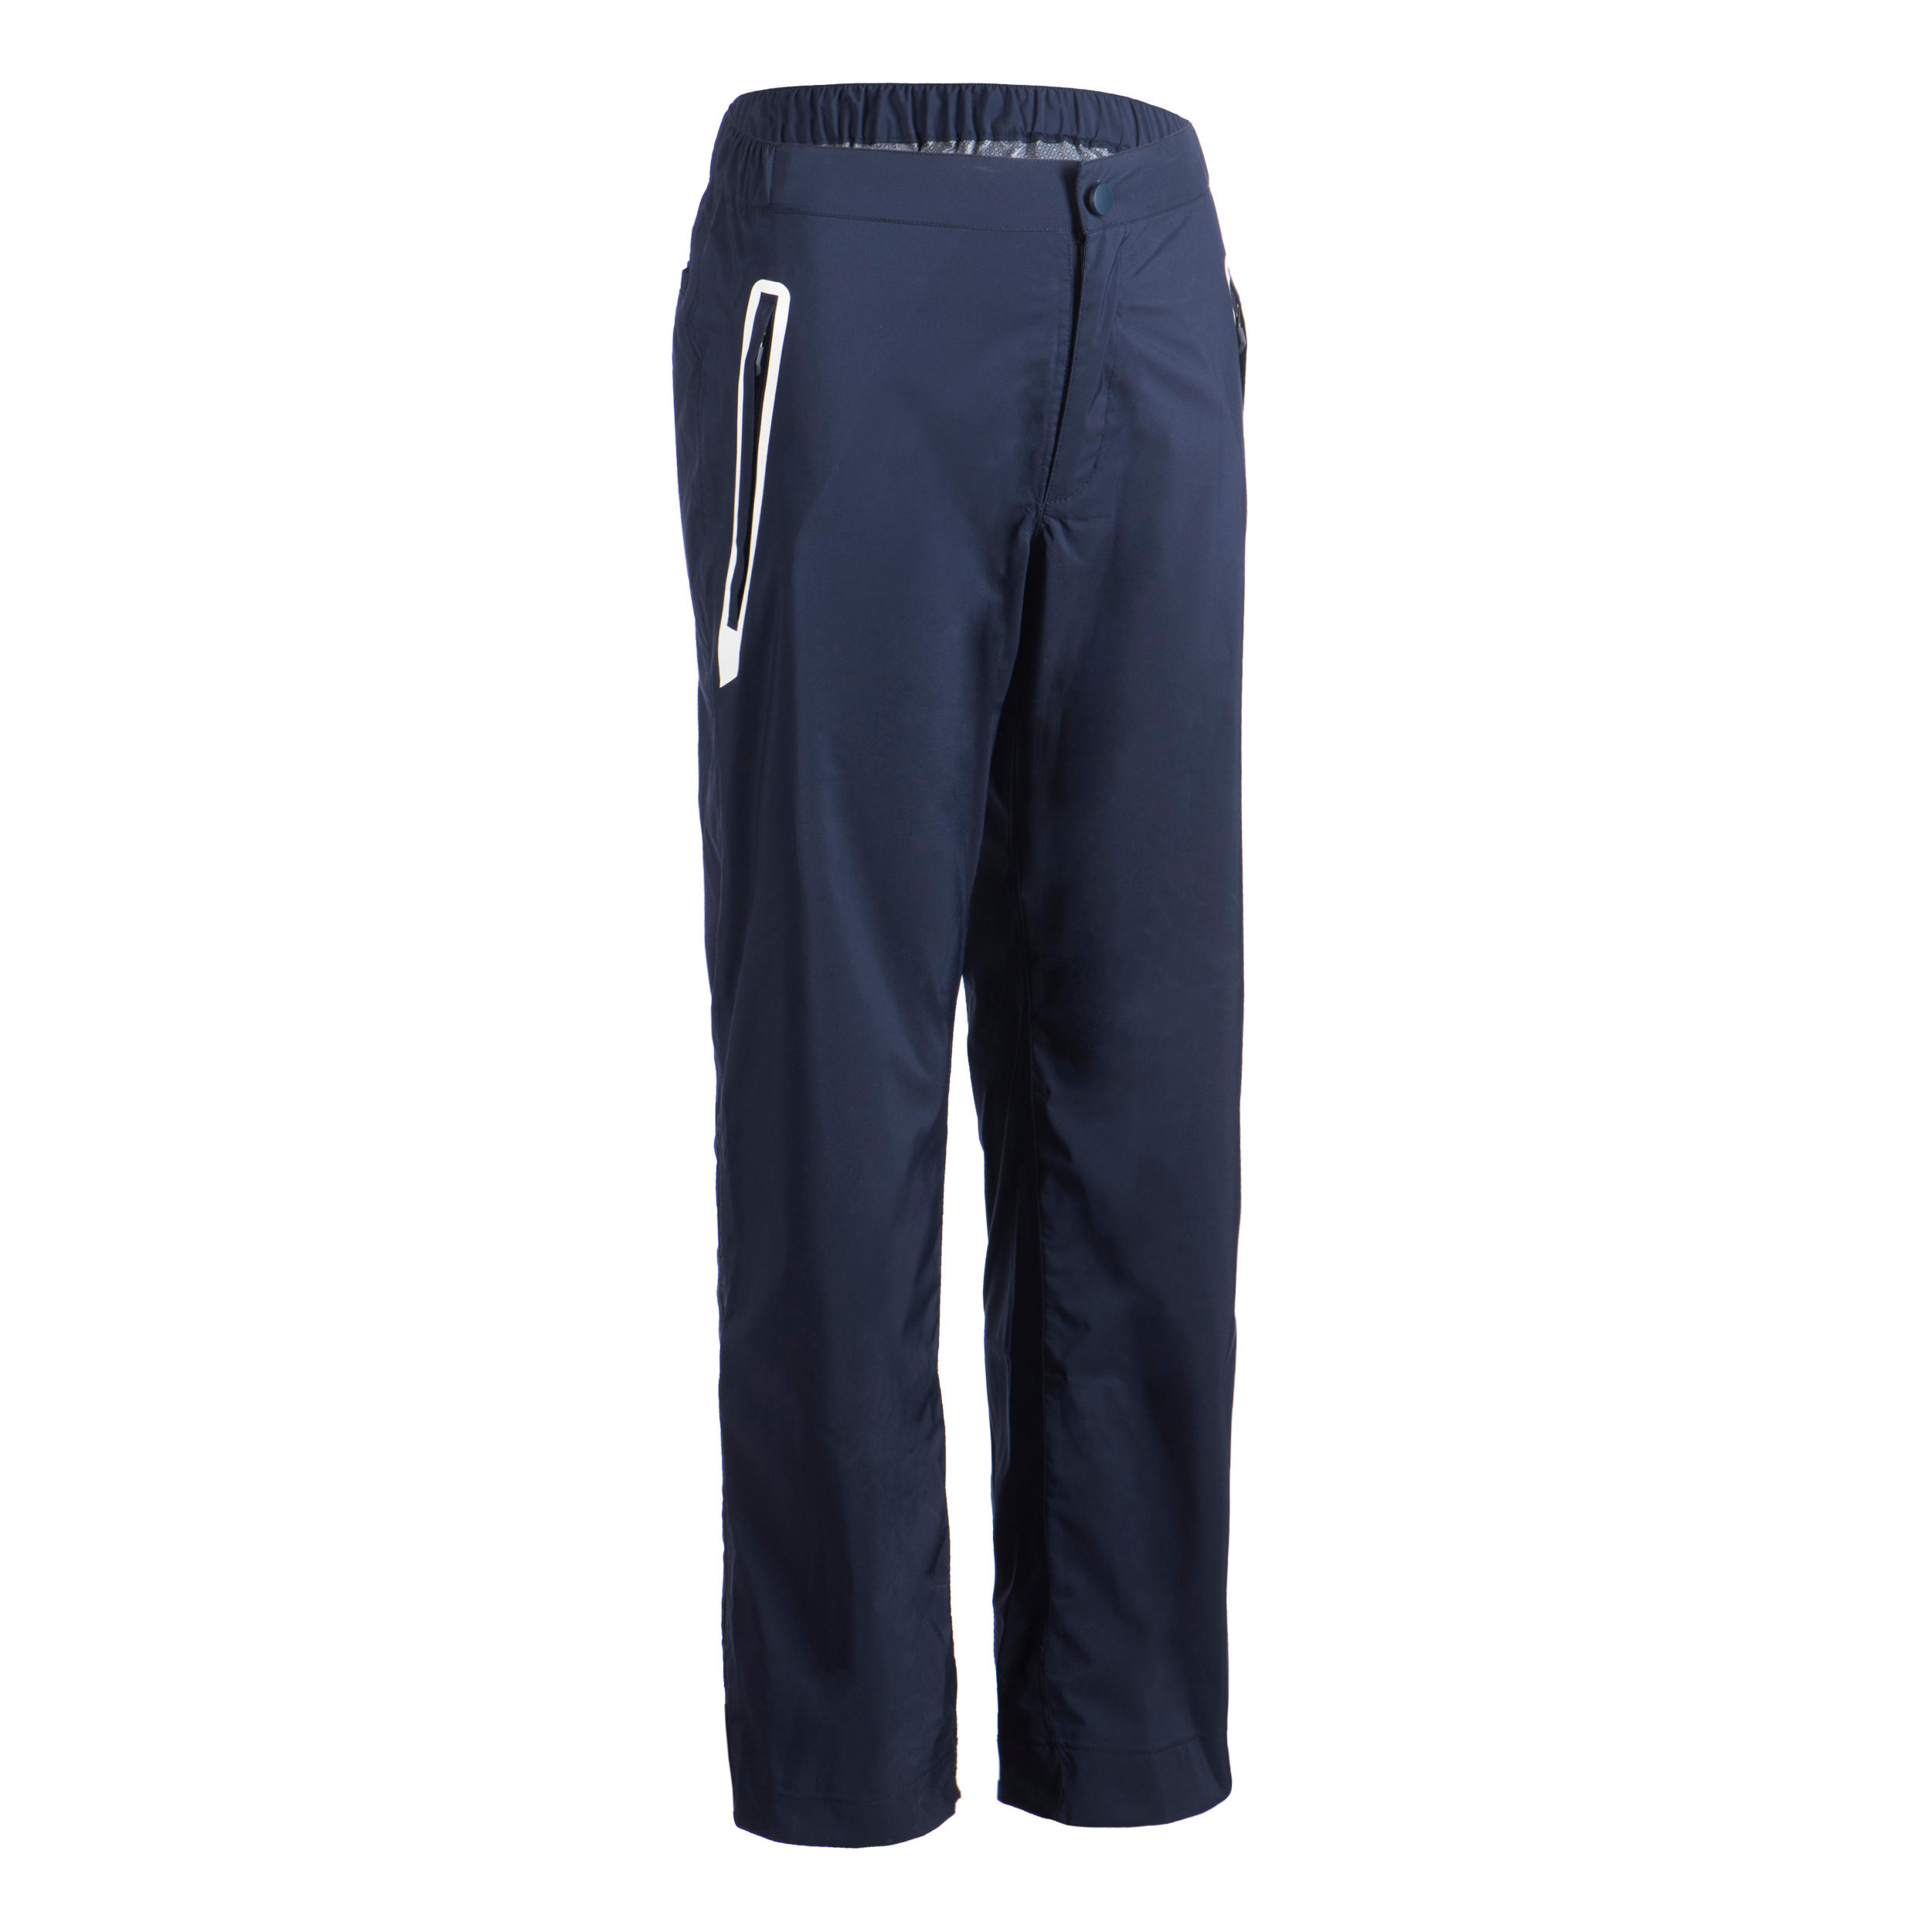 Pantalon Impermeabil Copii imagine